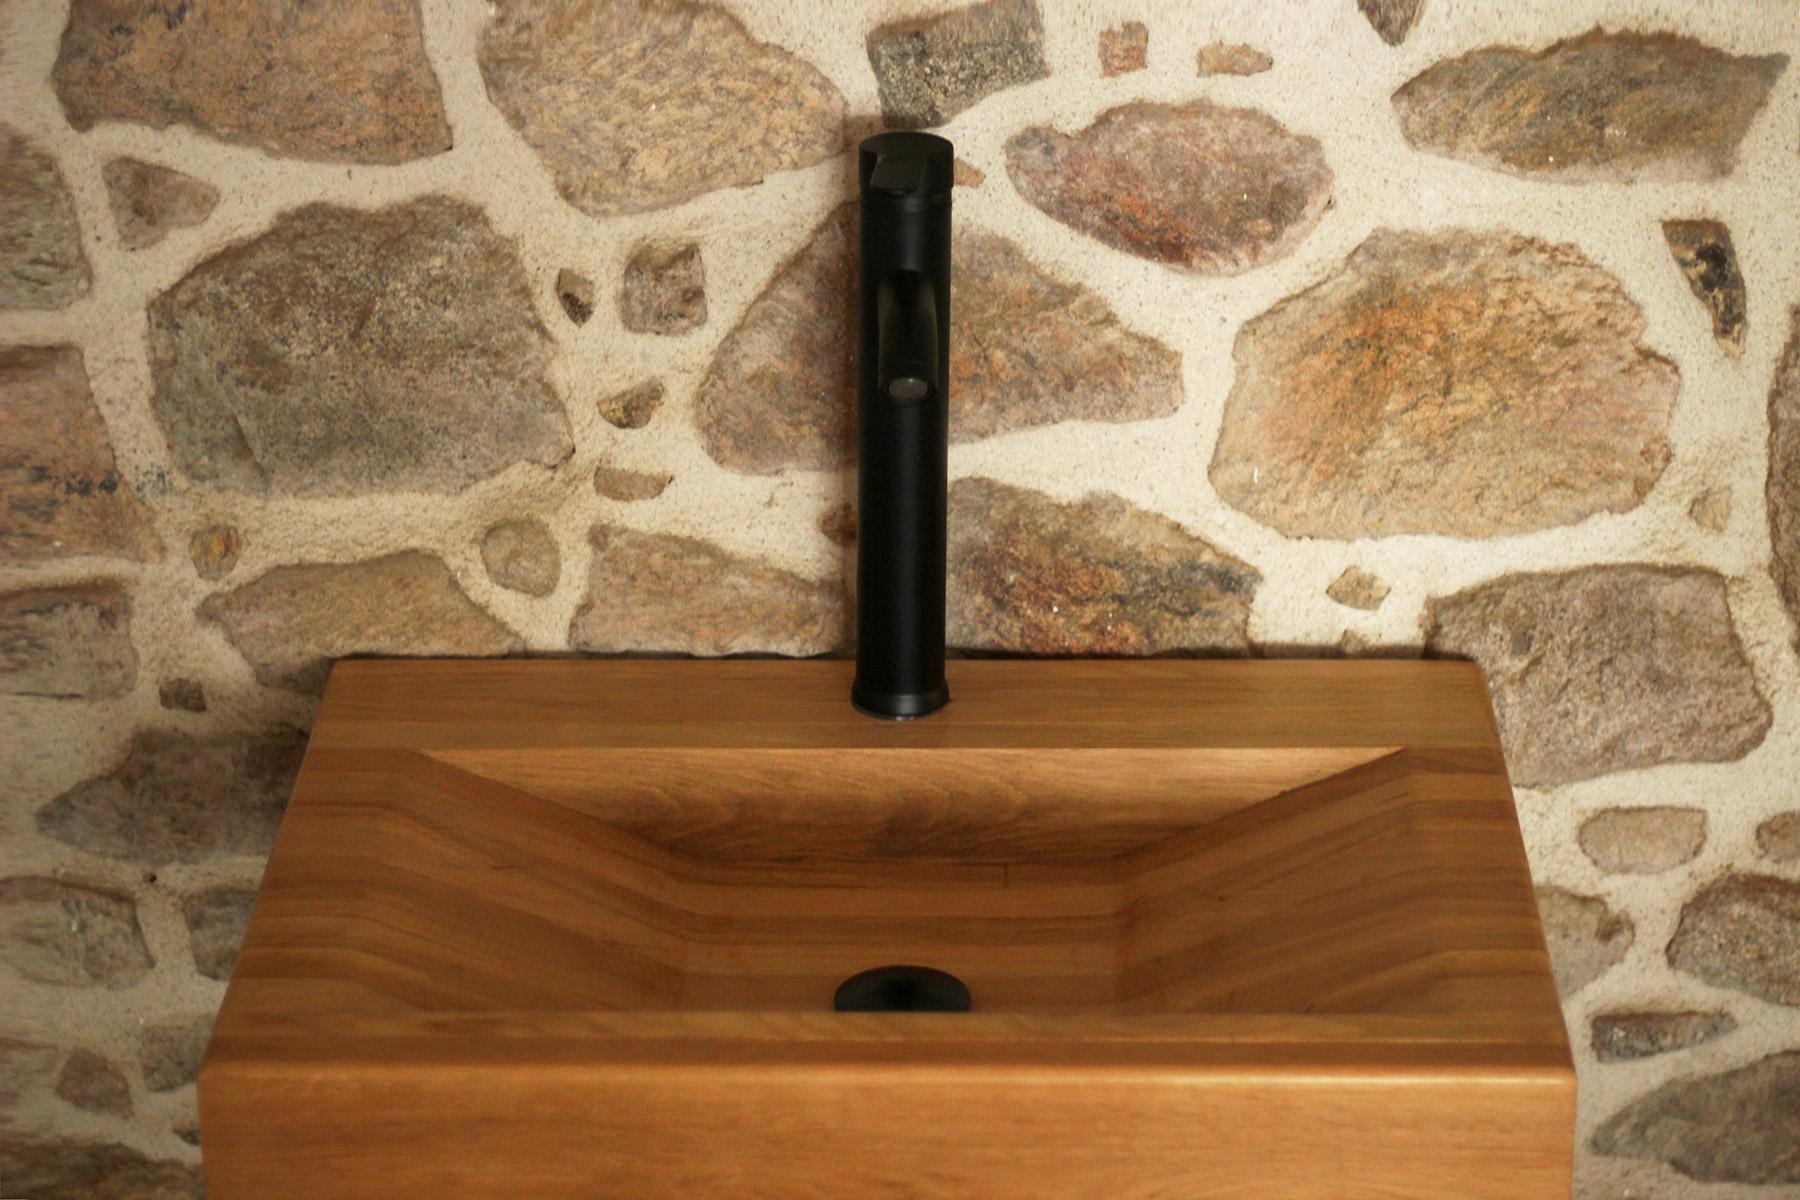 Wooden-Sink-bathroom-Interior-design-FabsFurniture